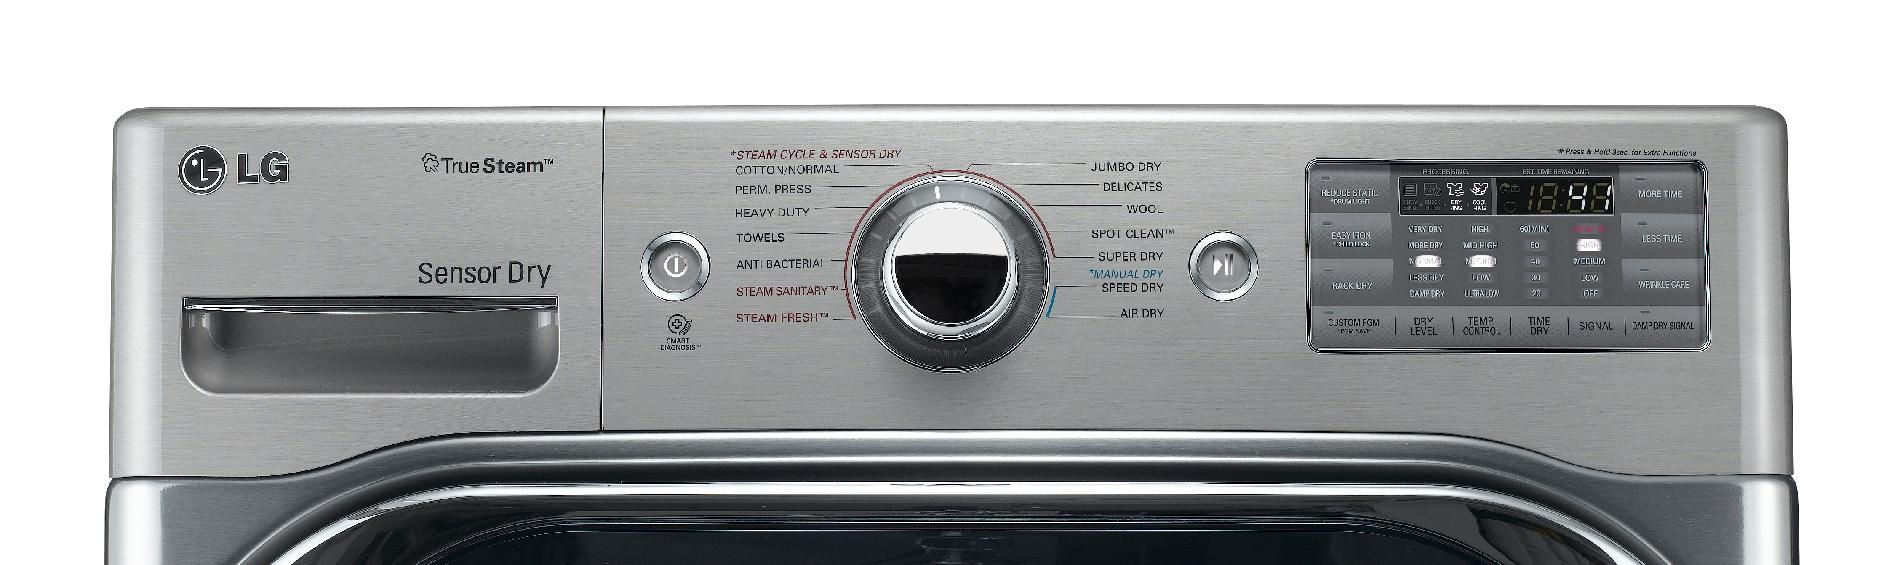 LG 9.0 cu. ft. Mega-Capacity Steam  Gas Dryer w/ Sensor Dry  - Graphite Steel